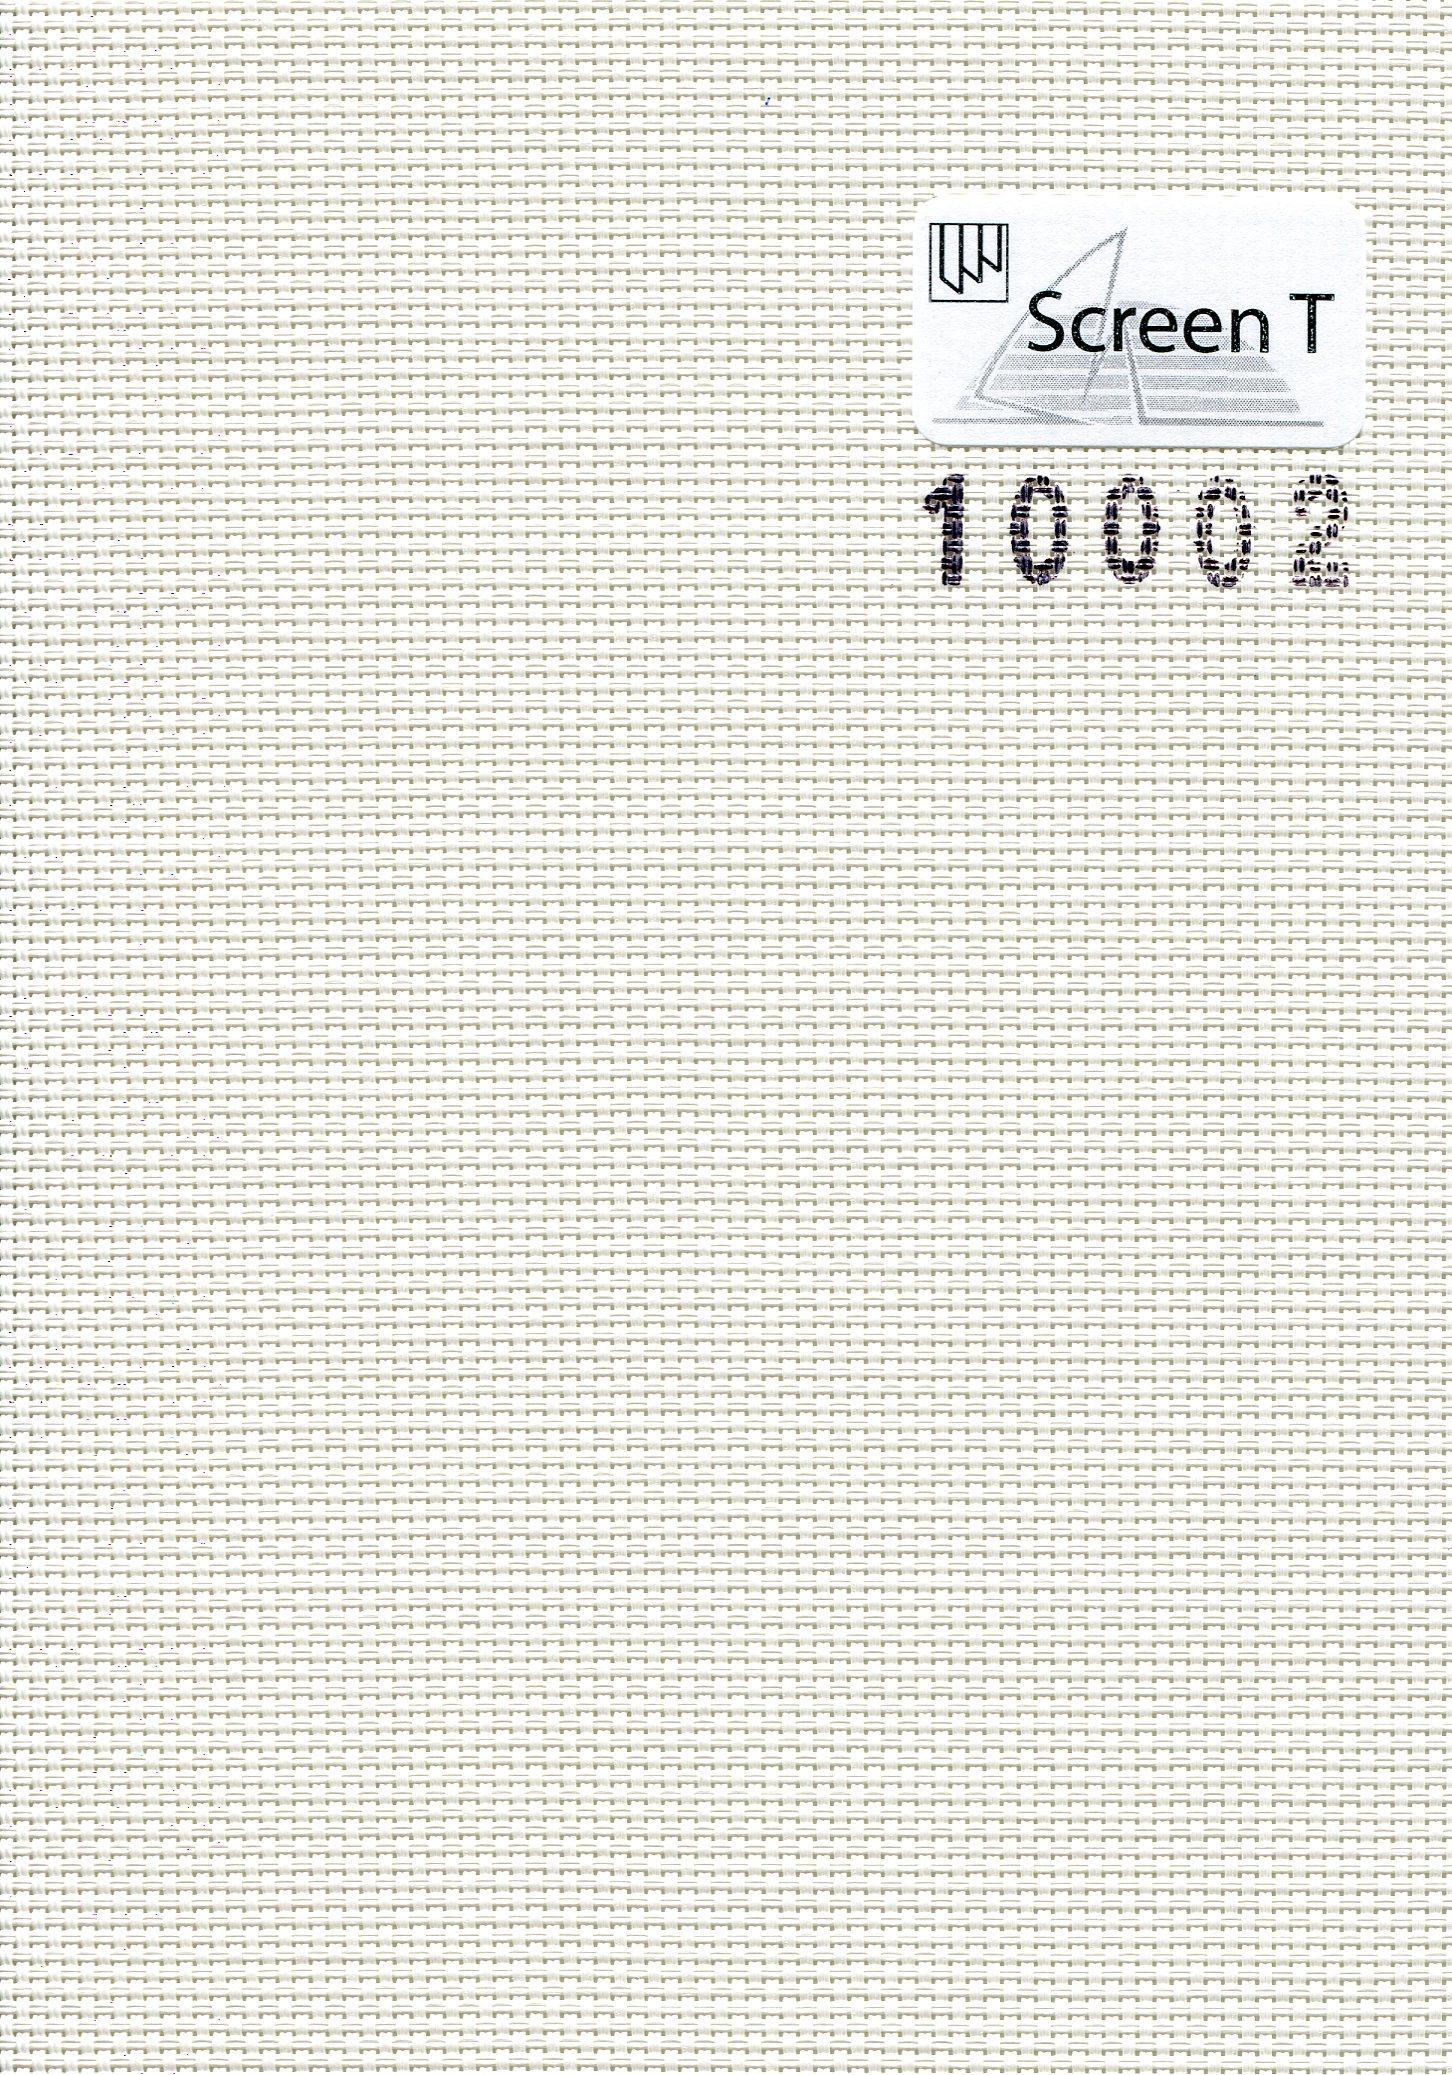 Screen T 10002